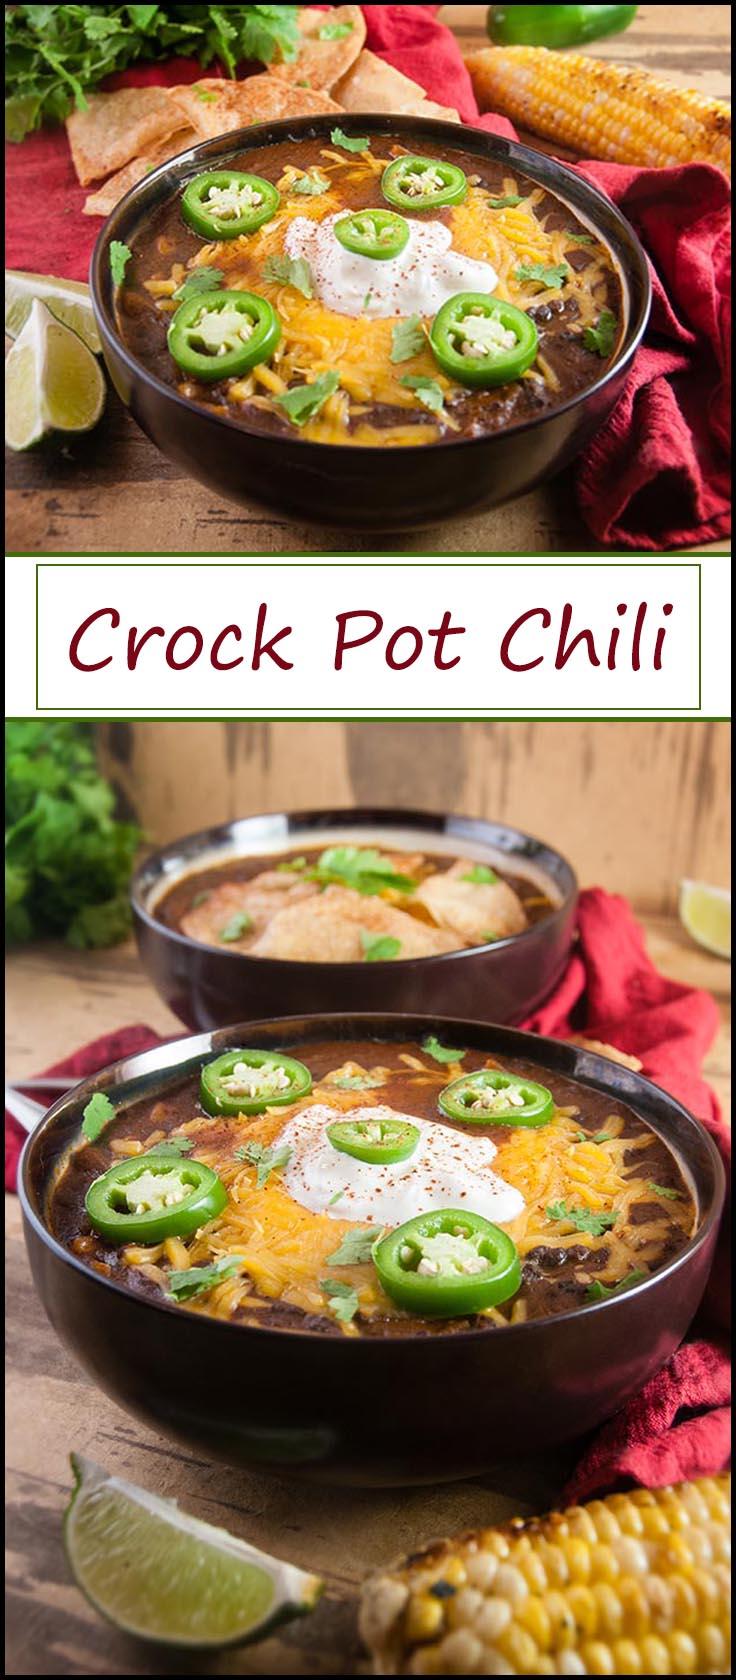 Easy Crock Pot Chili